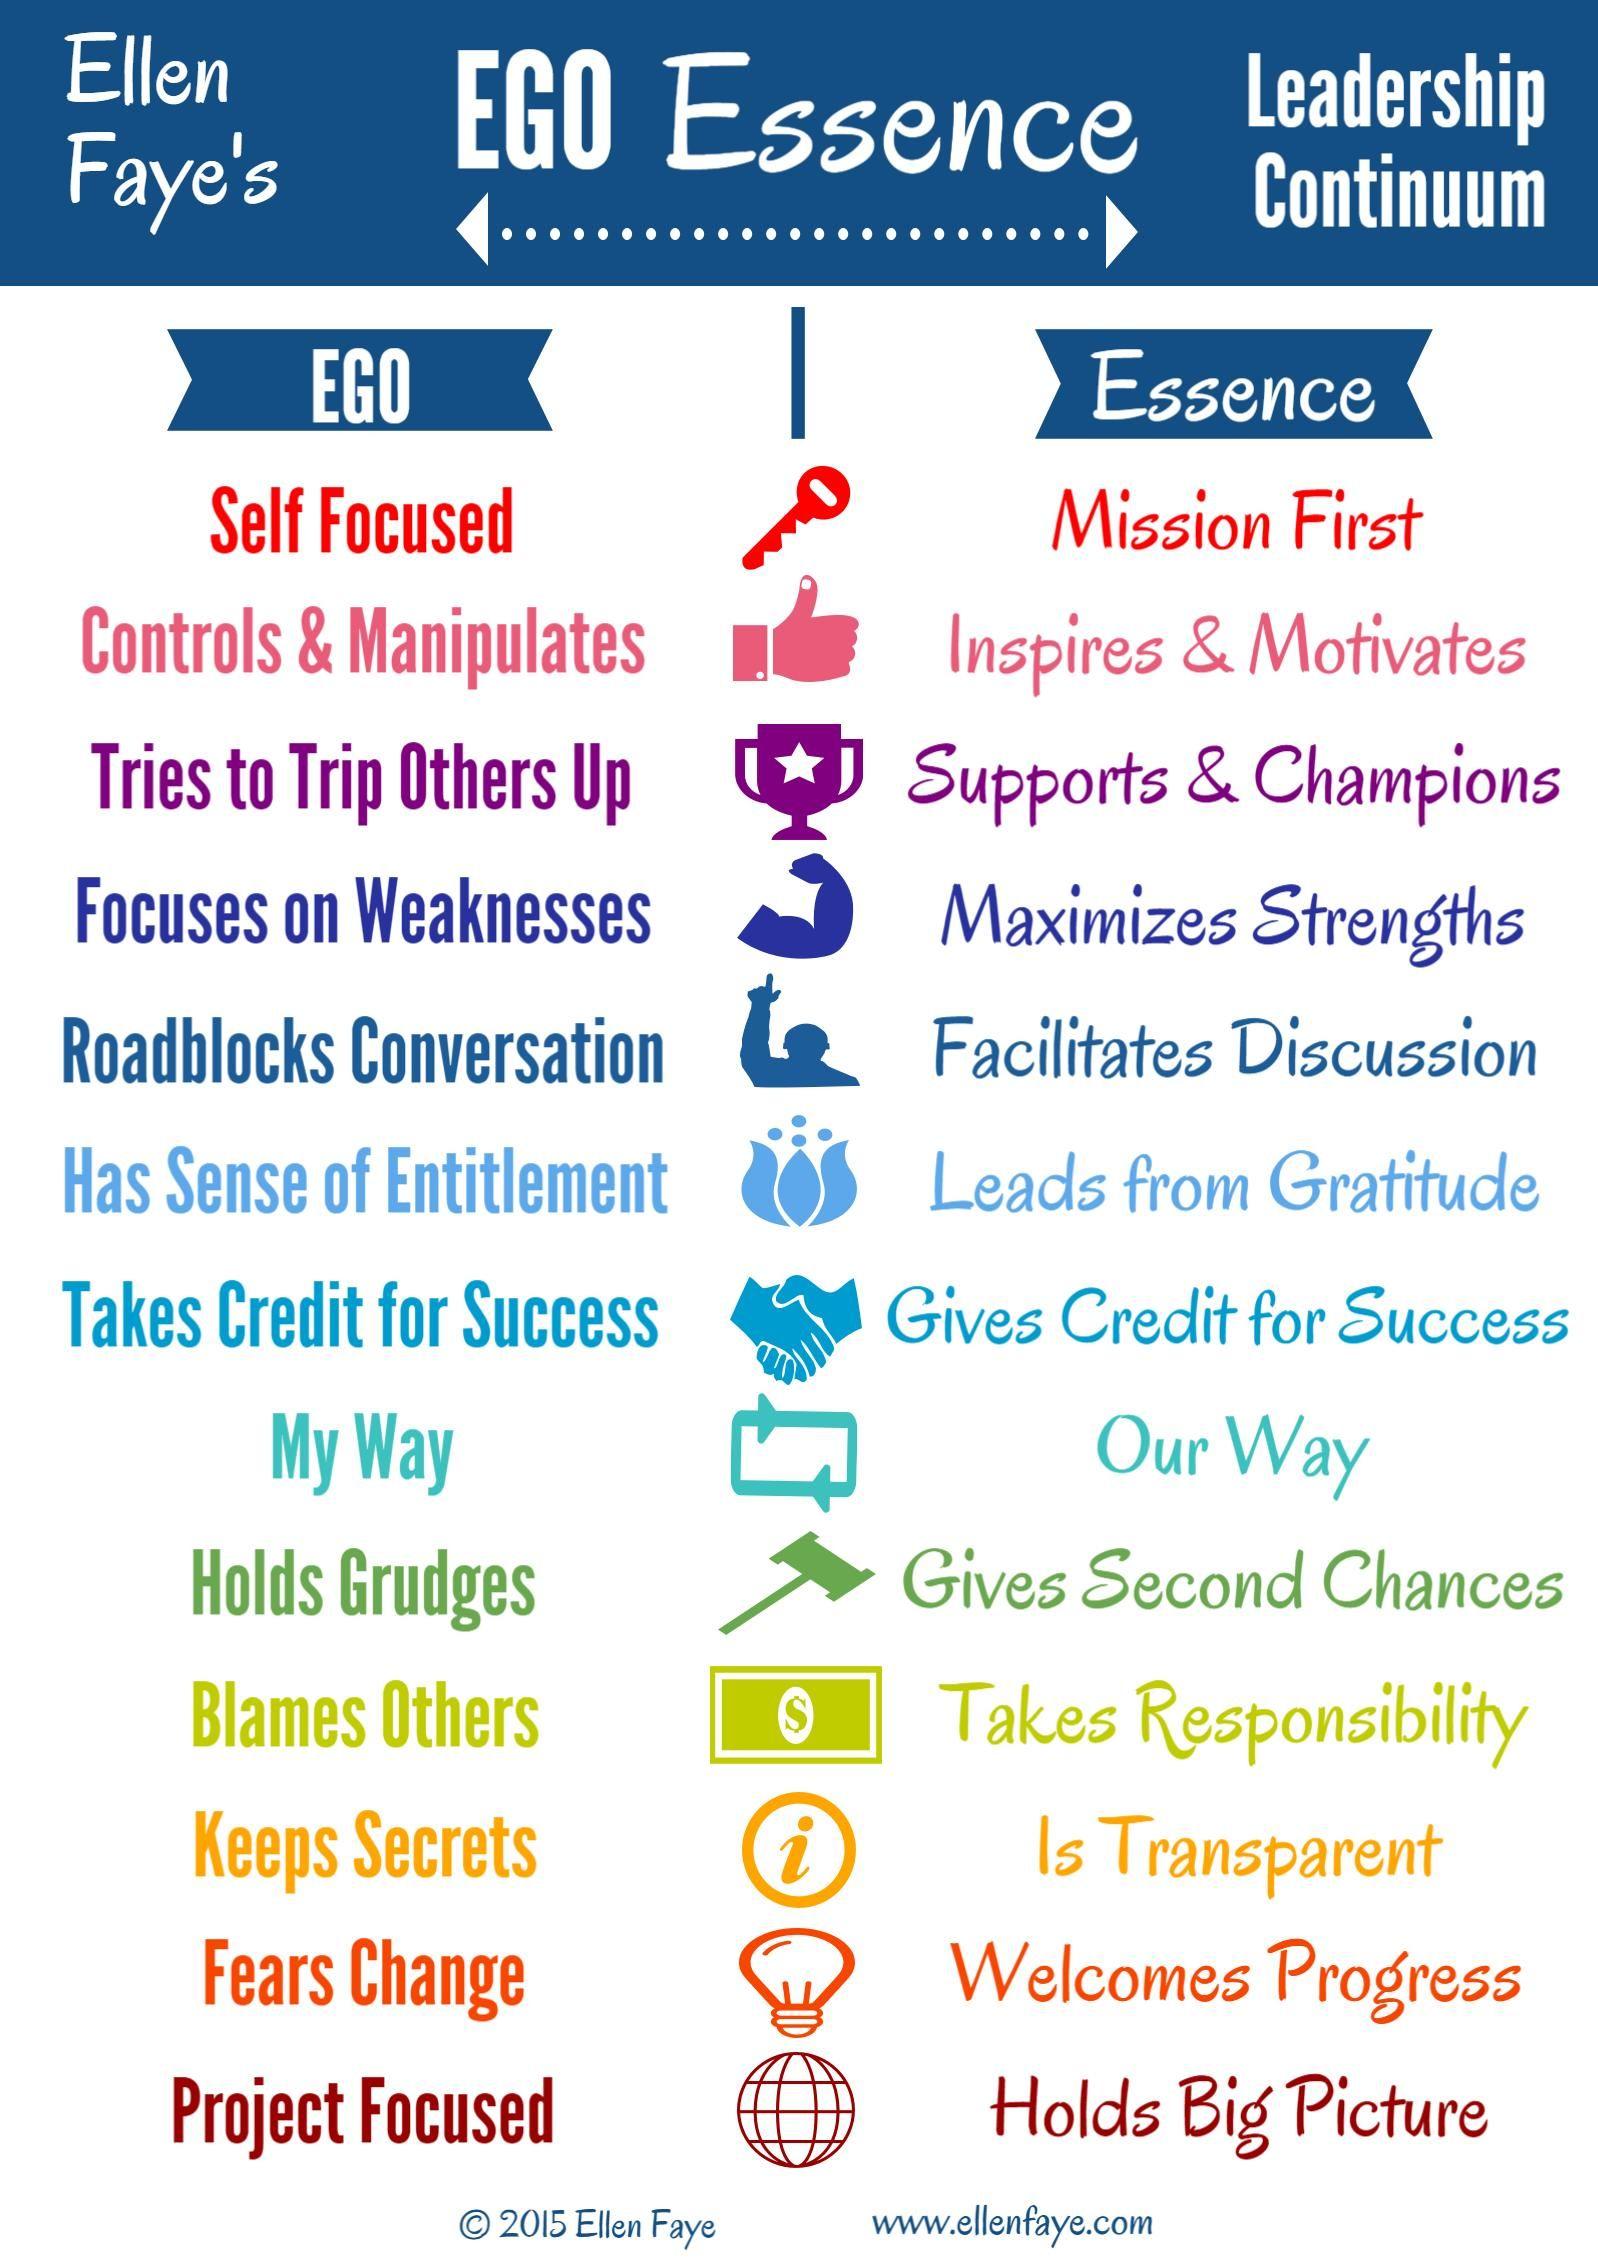 Ellen Faye's Ego Essence Leadership Continuum